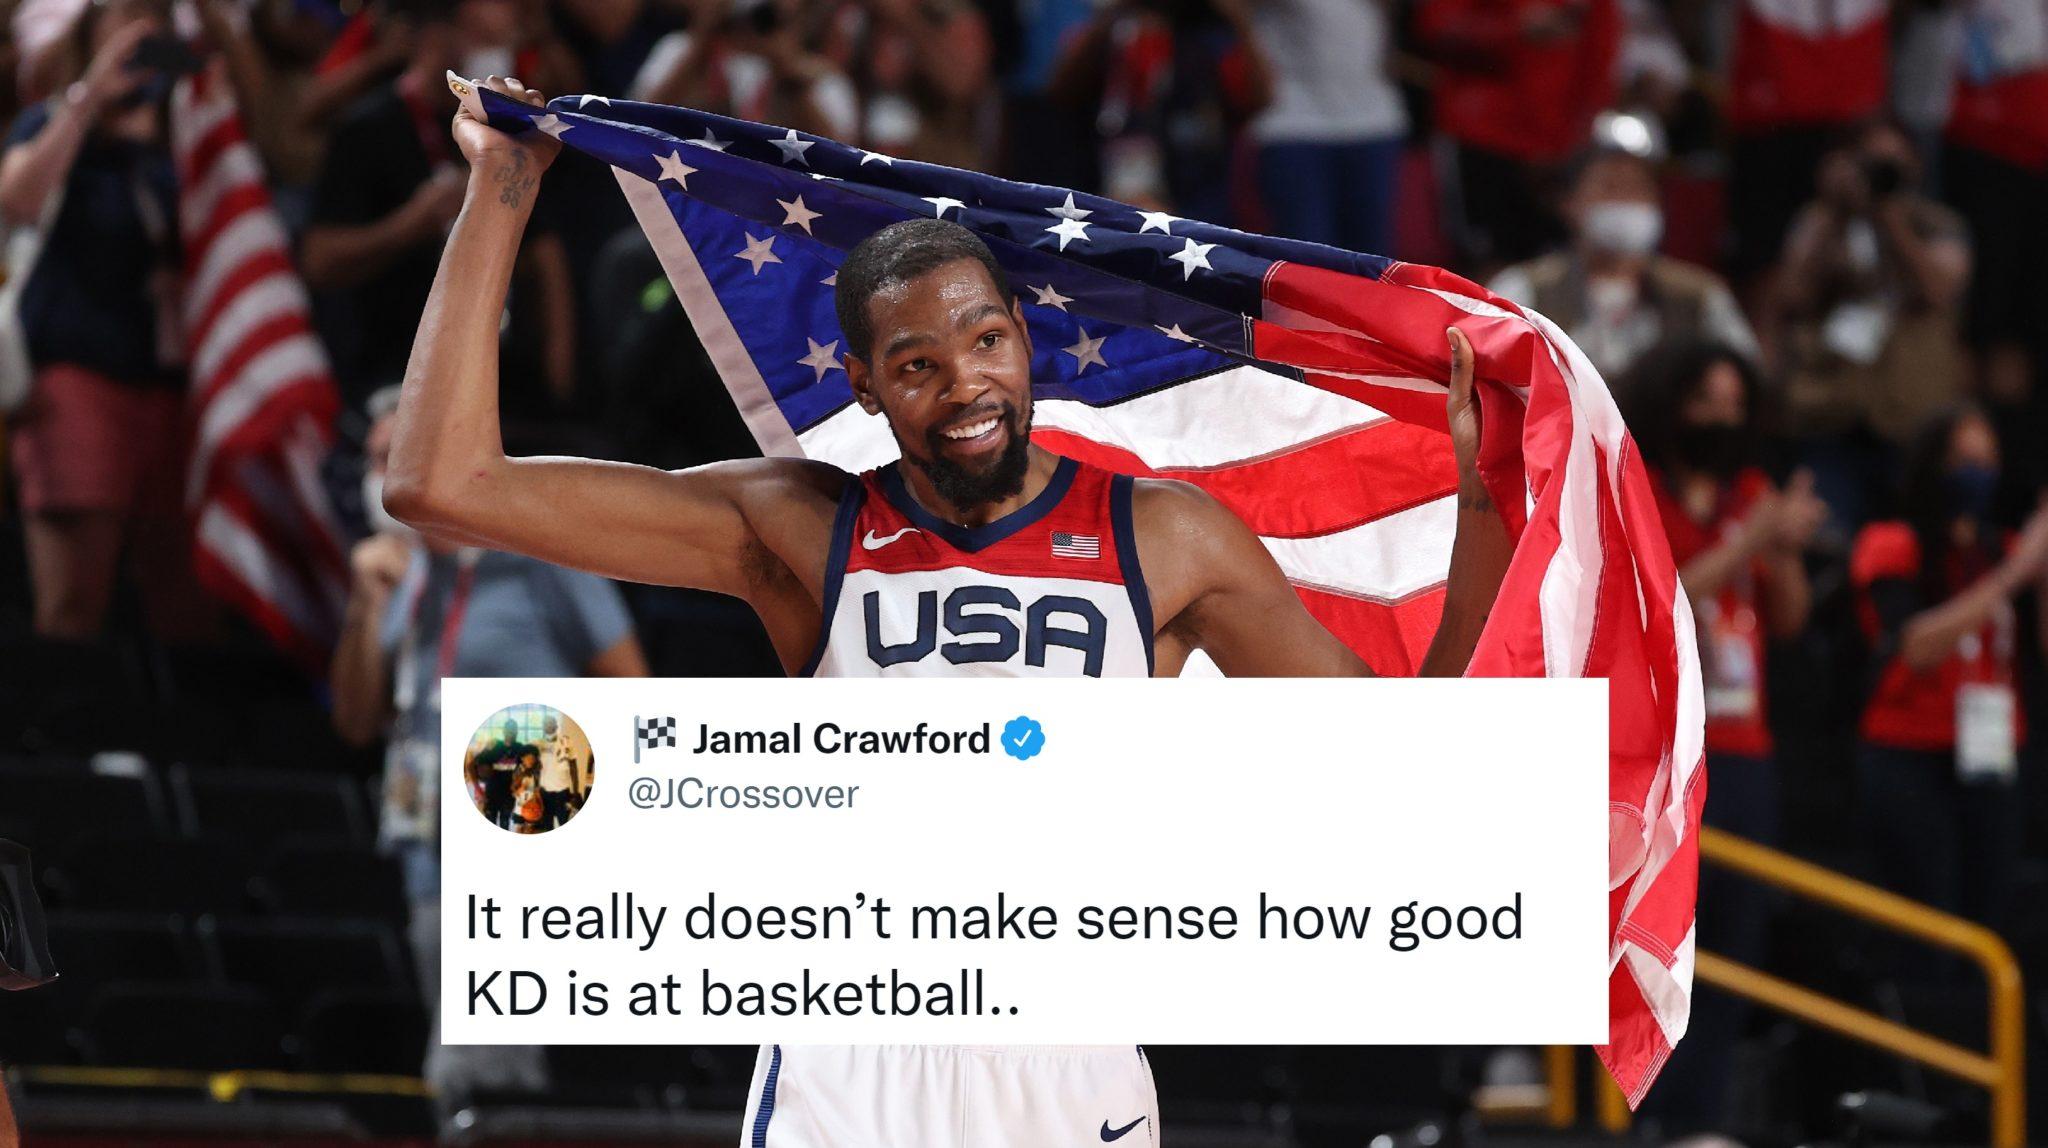 NBA Players React to USA Winning Dramatic Gold Medal Match